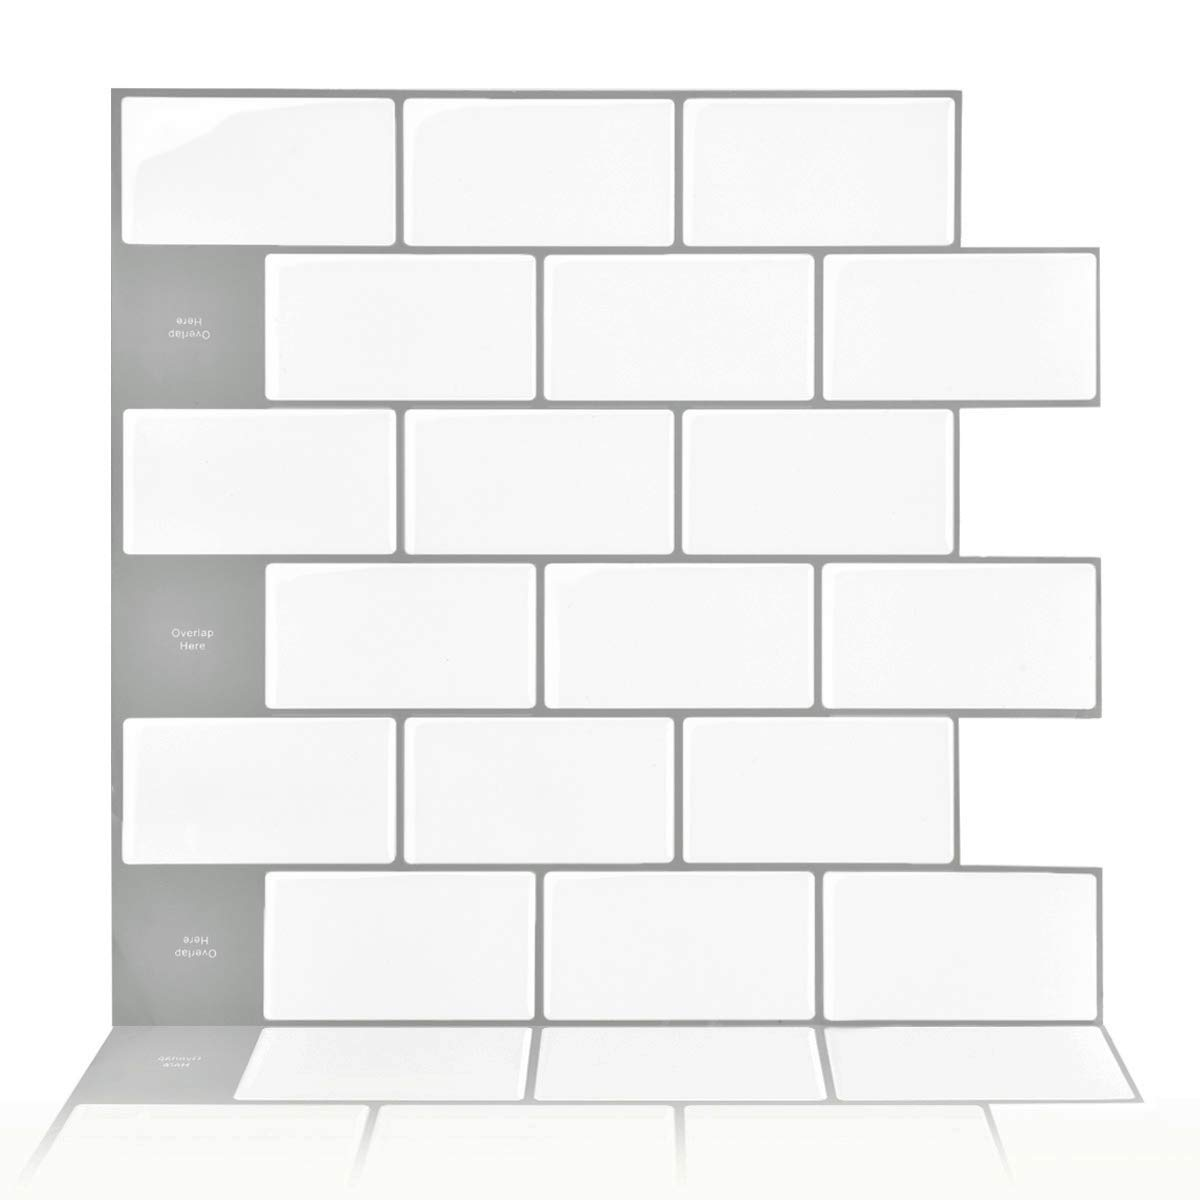 Vamos Tile, Upgraded, 10-Sheet Subway Tiles Peel and Stick Backsplash,Stick on Tiles Kitchen Backsplash - Premium Vinyl Anti Mold Tiles, White Tiles for Bathroom & Fireplace Decorations